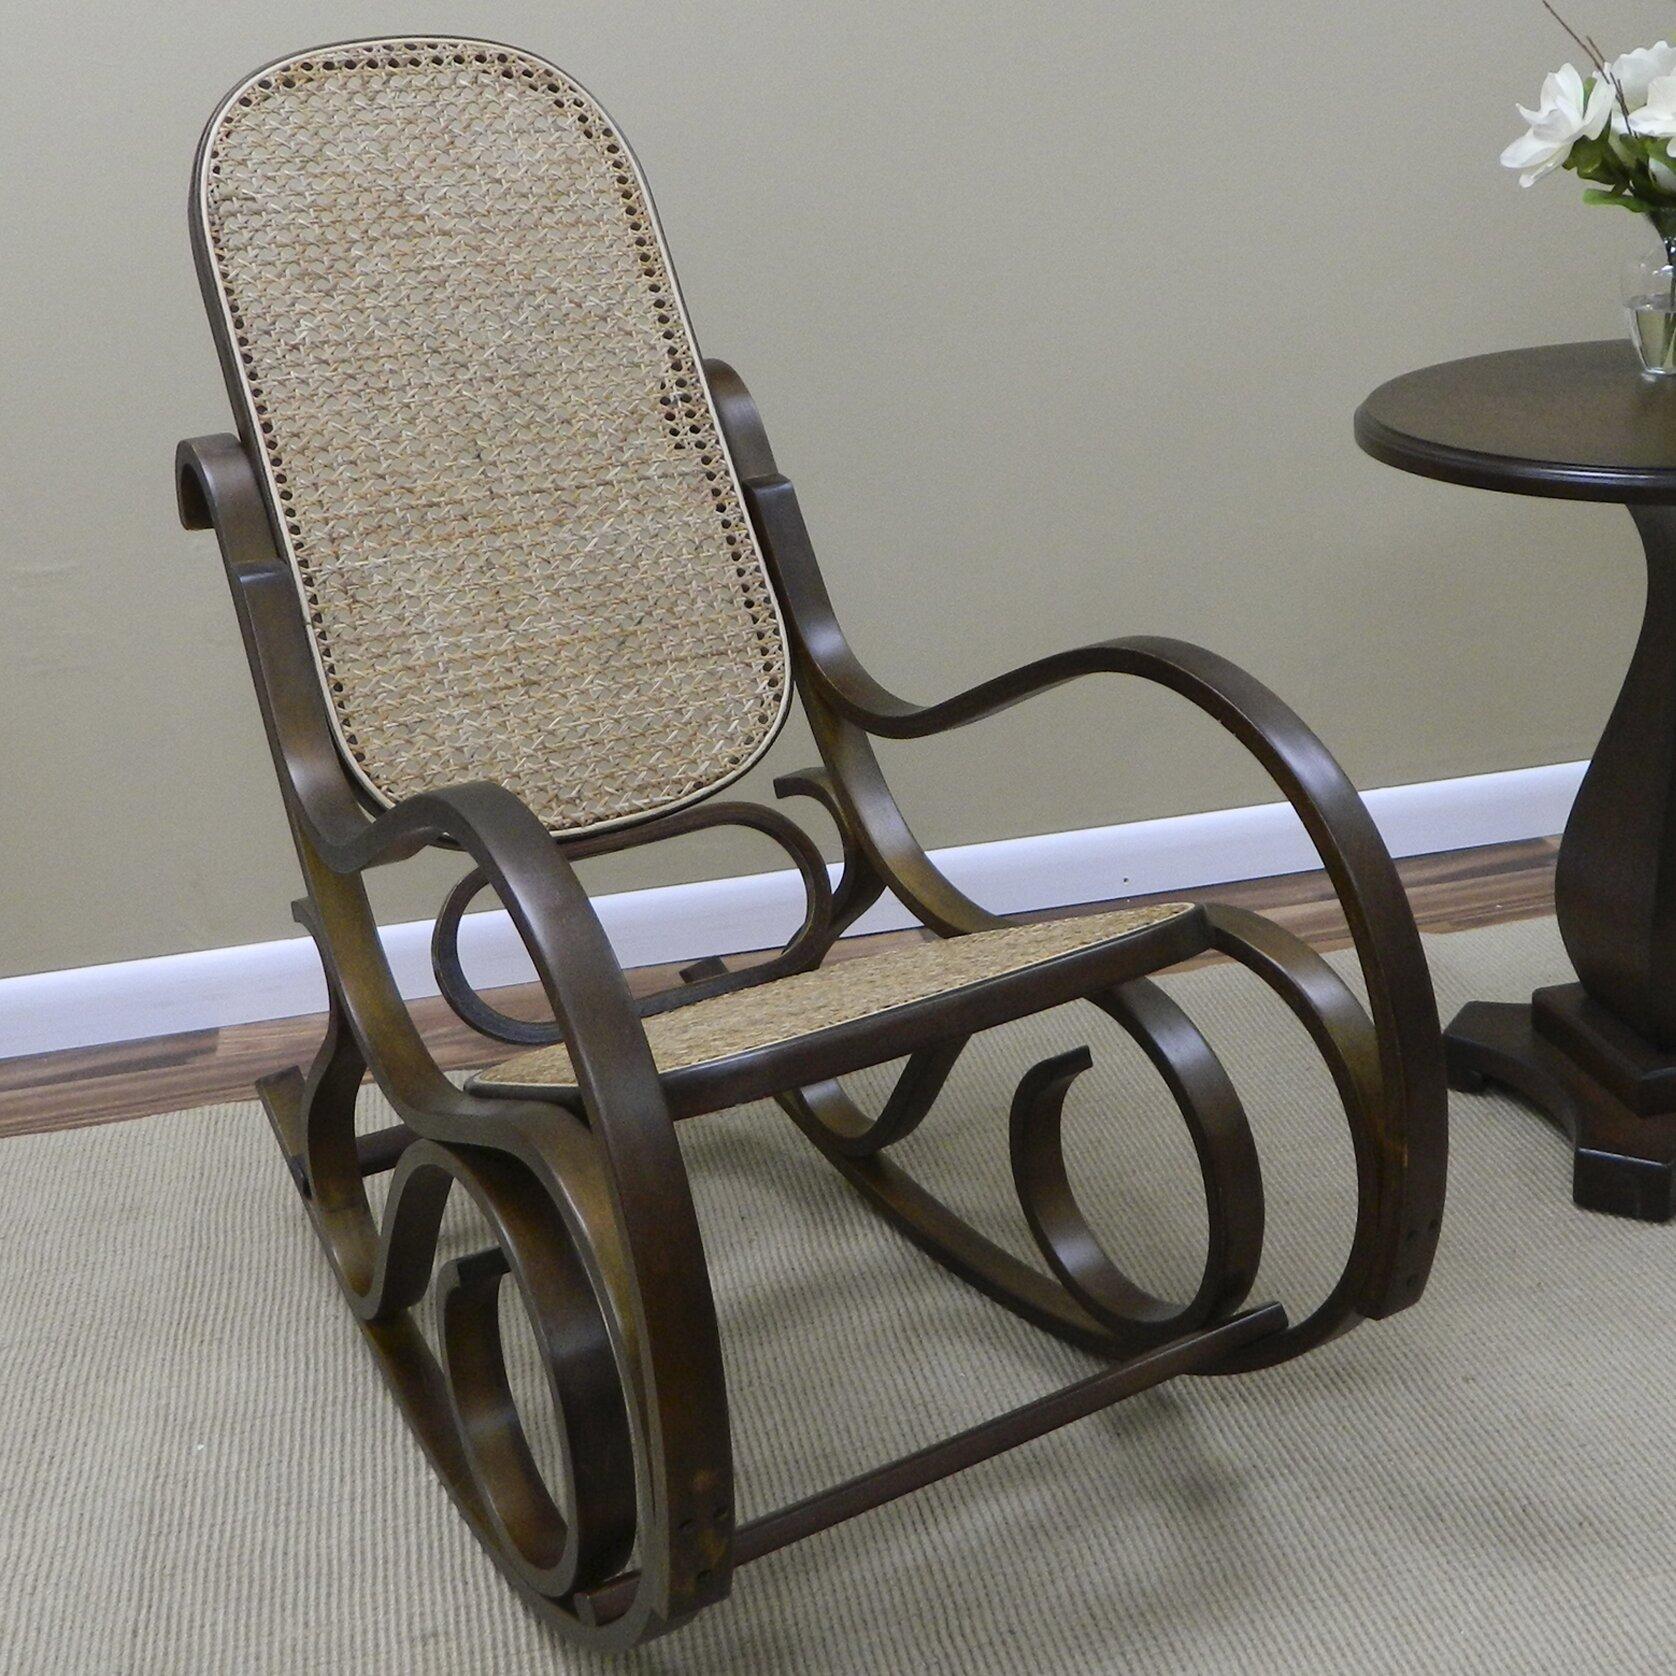 Bentwood rocking chair repair - Victoria Bentwood Rocking Chair